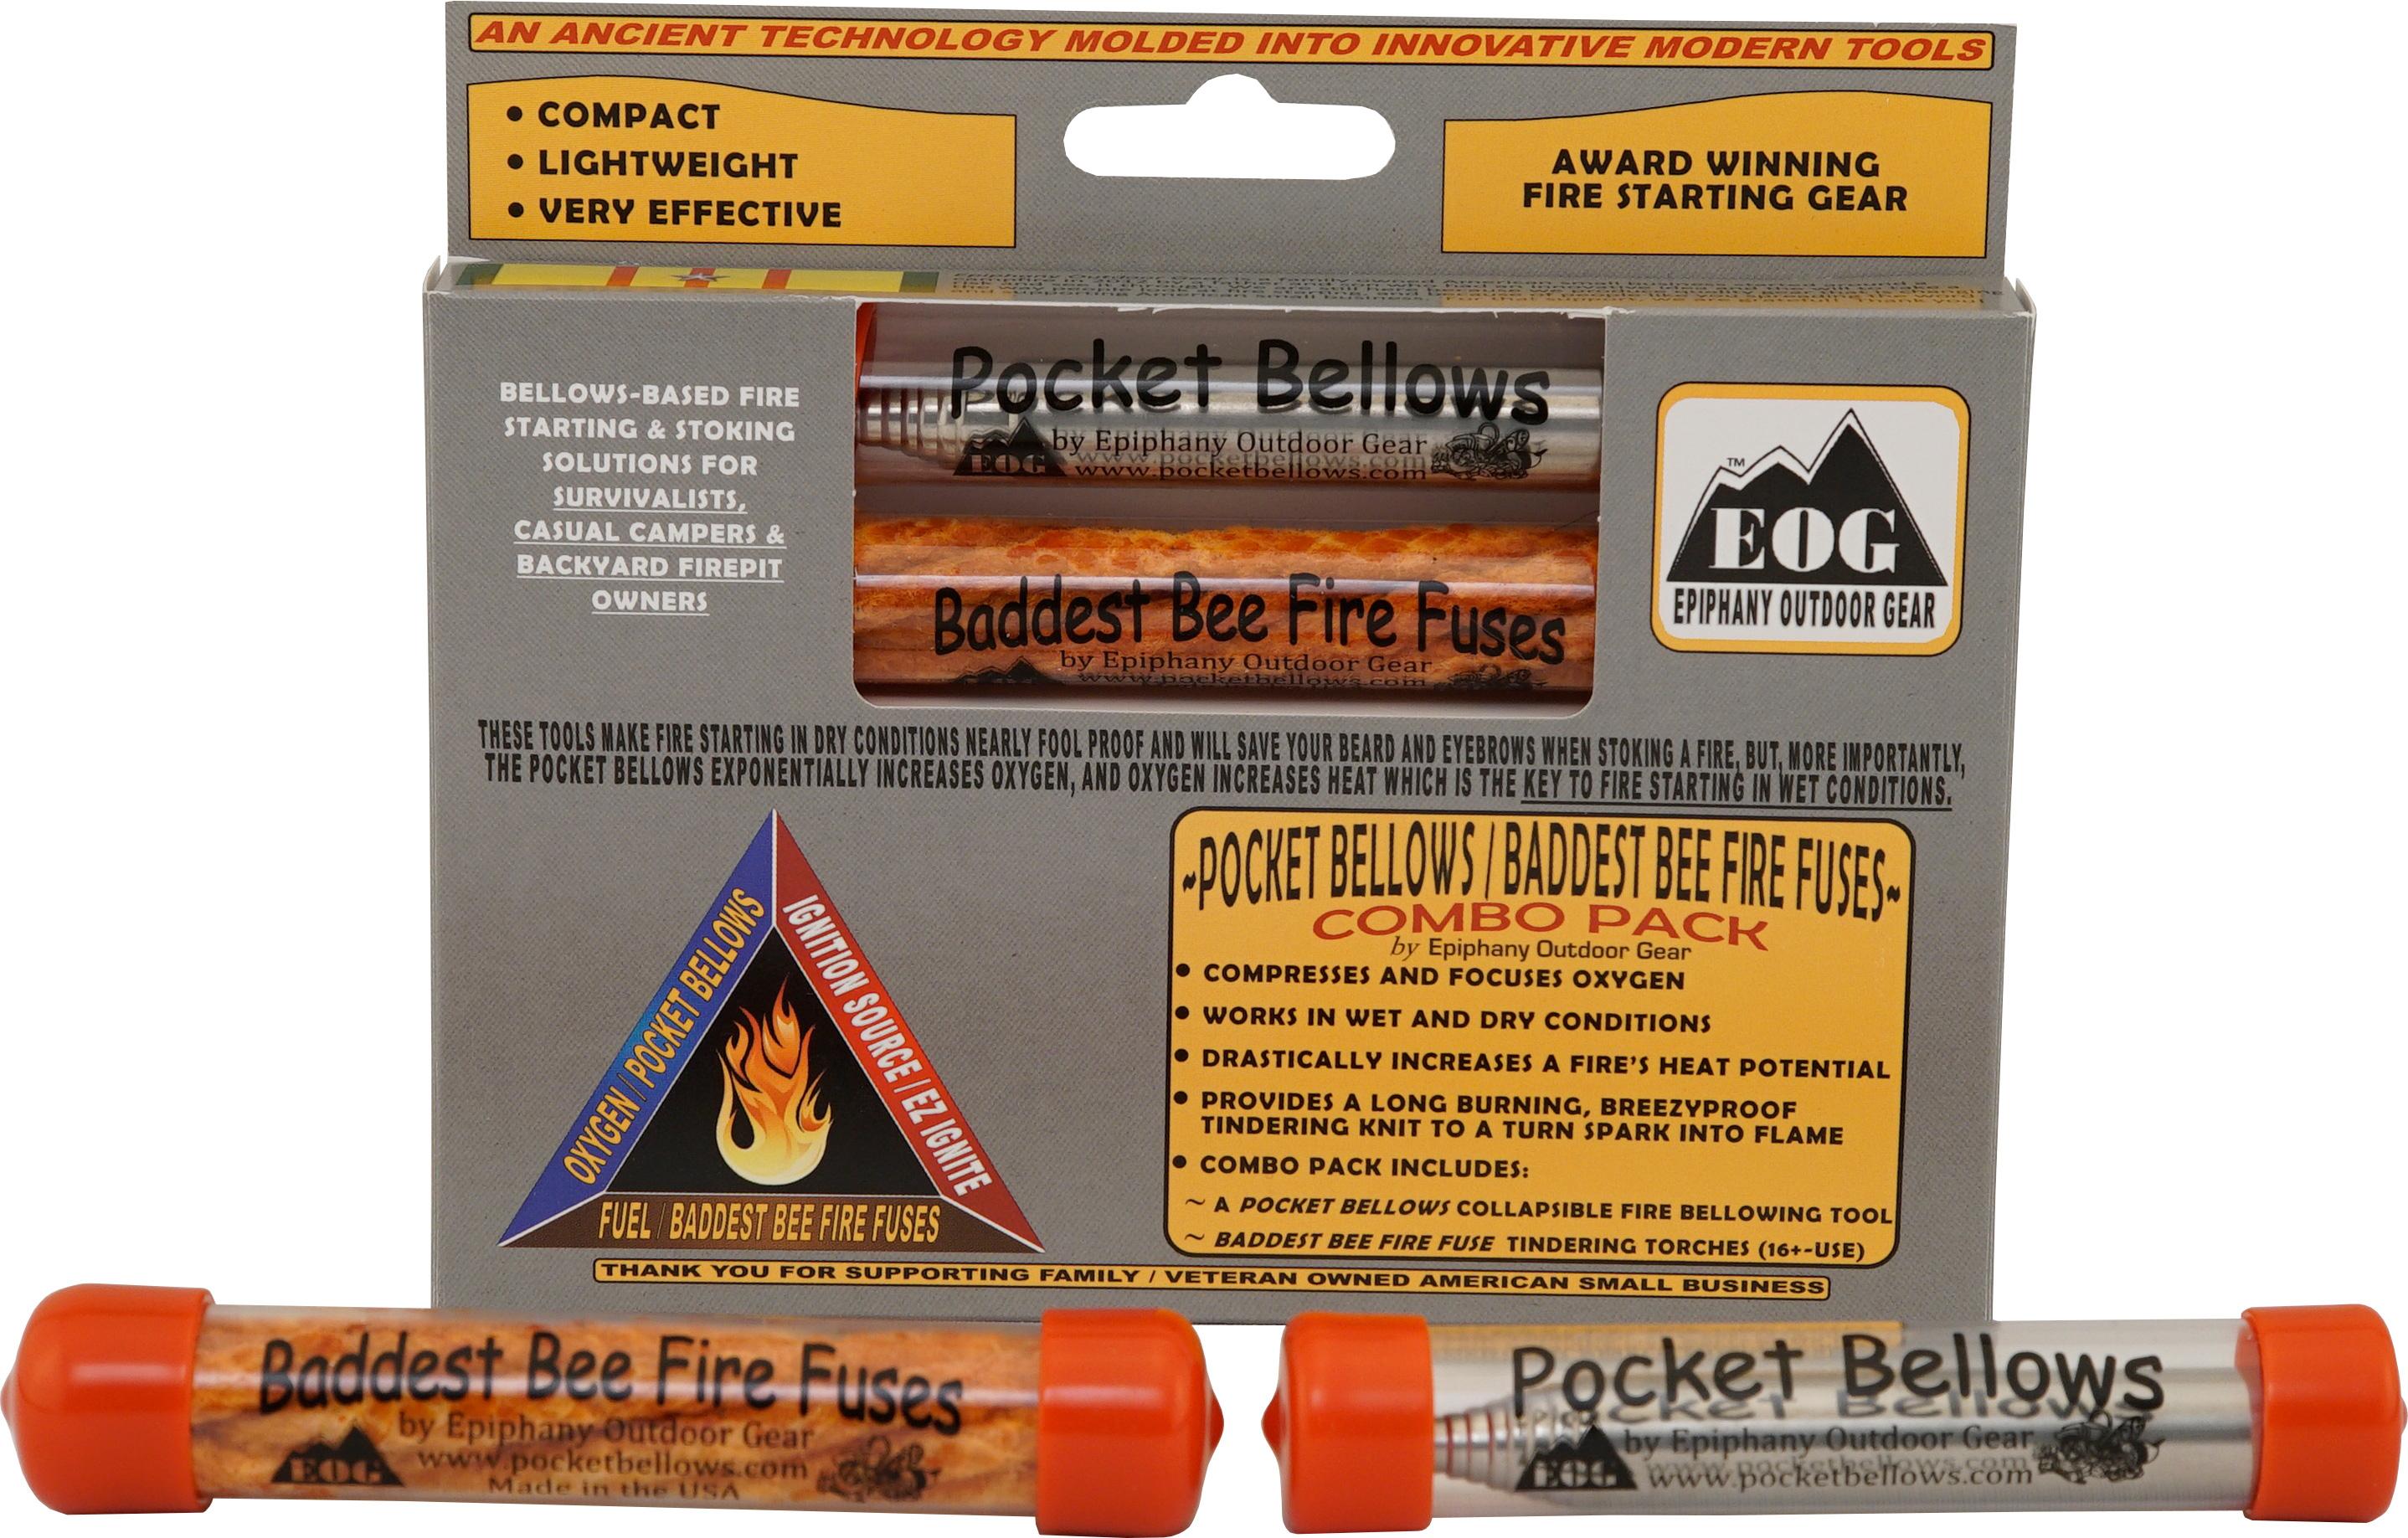 Epiphany Outdoor Gear Pocket Bellows/Baddest Bee Combo Box